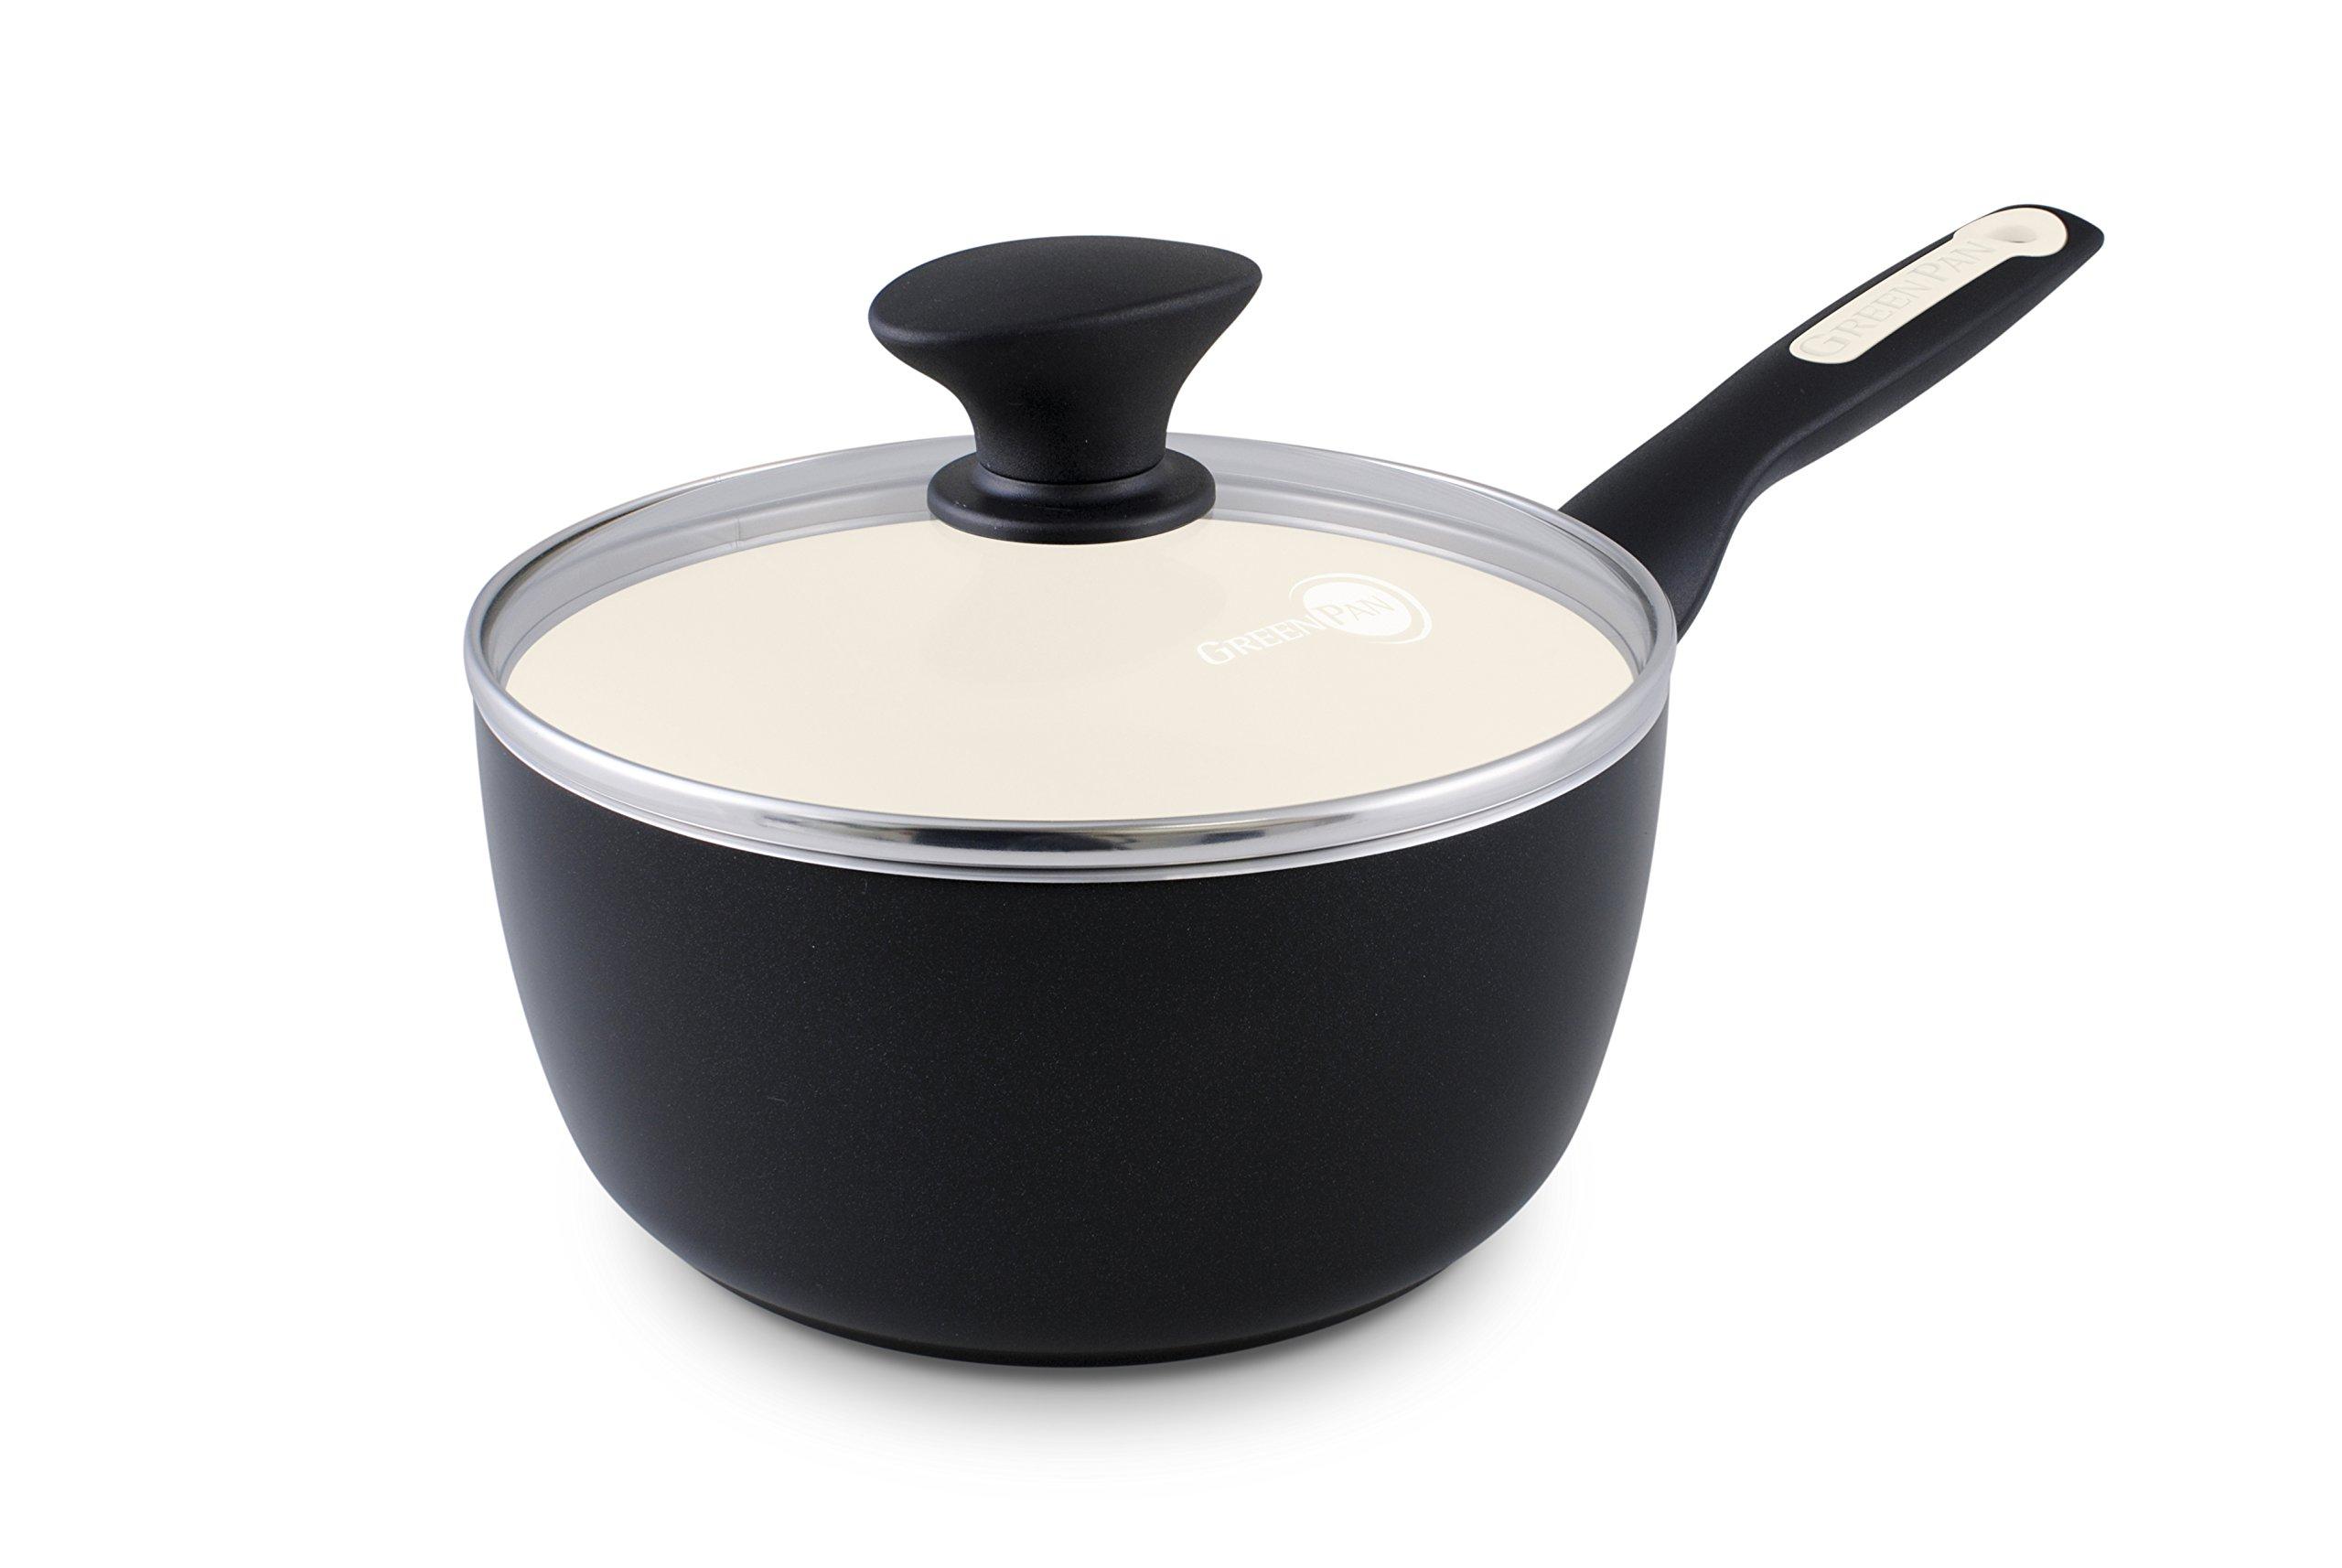 GreenPan Rio 2QT Ceramic Non-Stick Covered Saucepan, Black by GreenPan (Image #1)